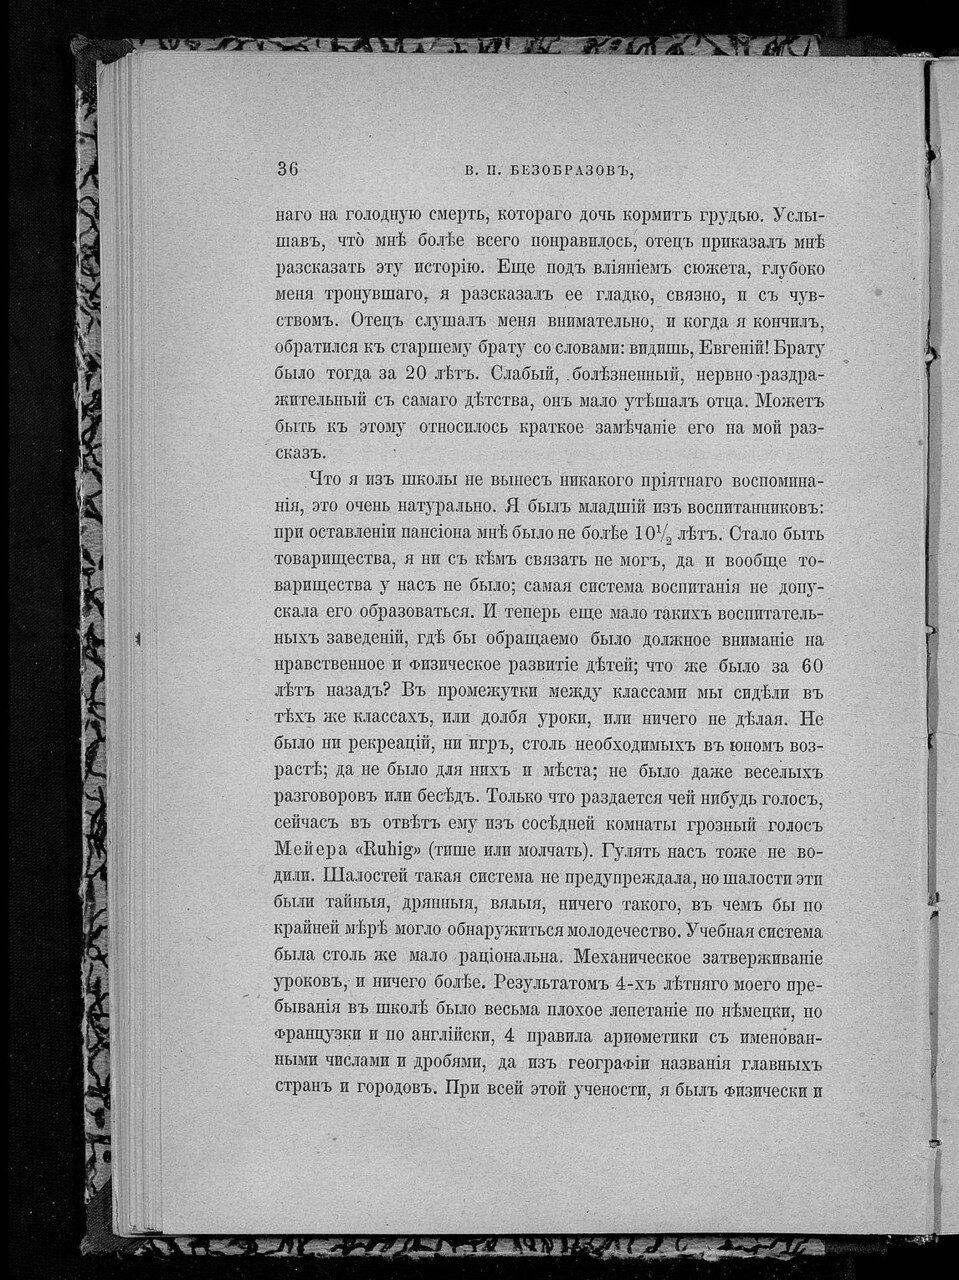 https://img-fotki.yandex.ru/get/742275/199368979.d4/0_21ddb6_69336670_XXXL.jpg